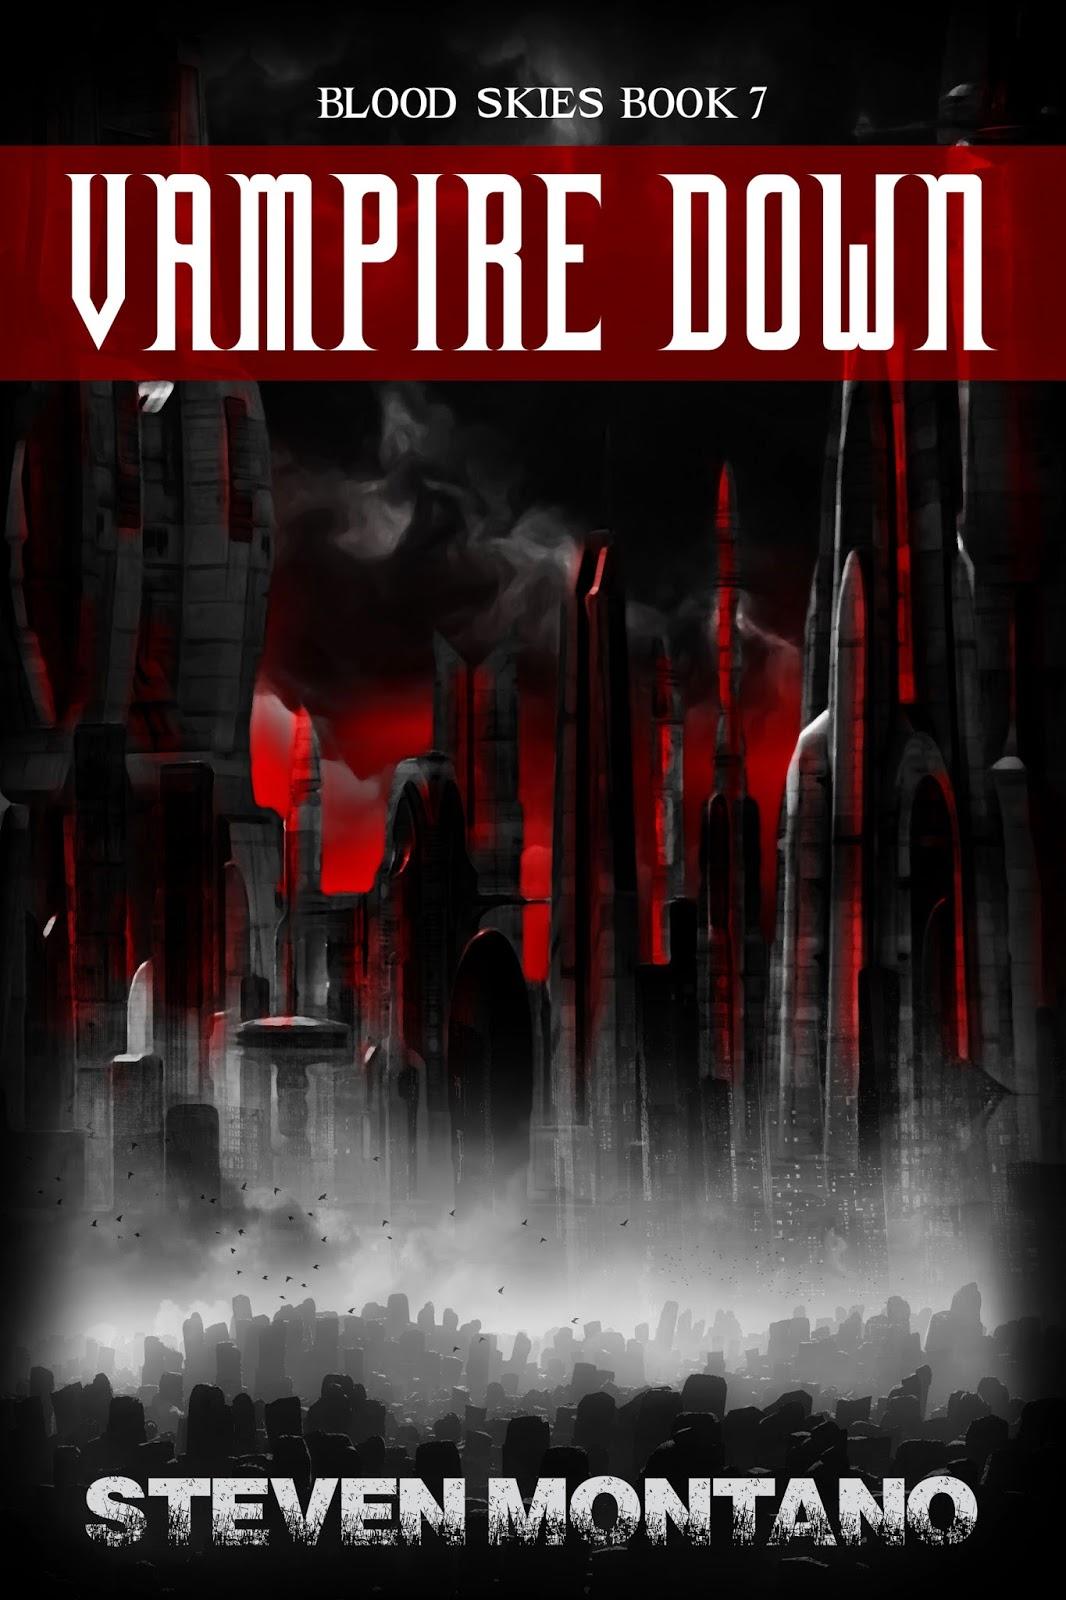 Cover Reveal: Vampire Down by Steven Montano